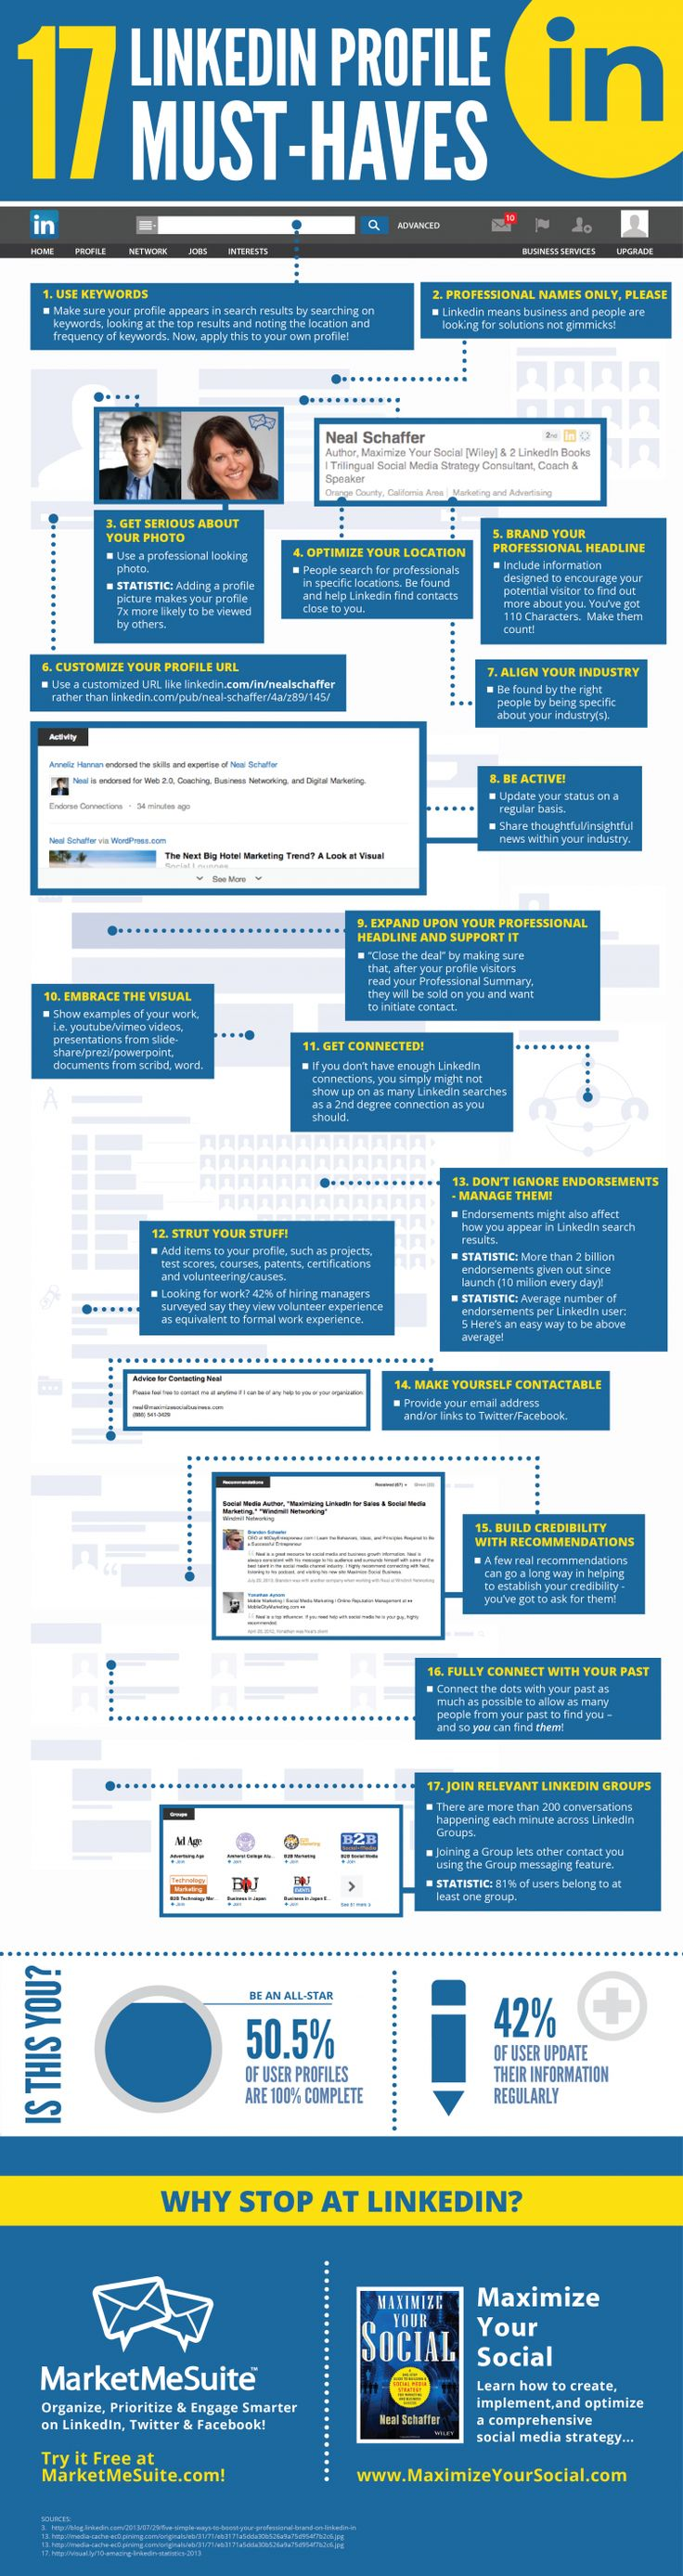 LinkedIn Profile Must-Haves